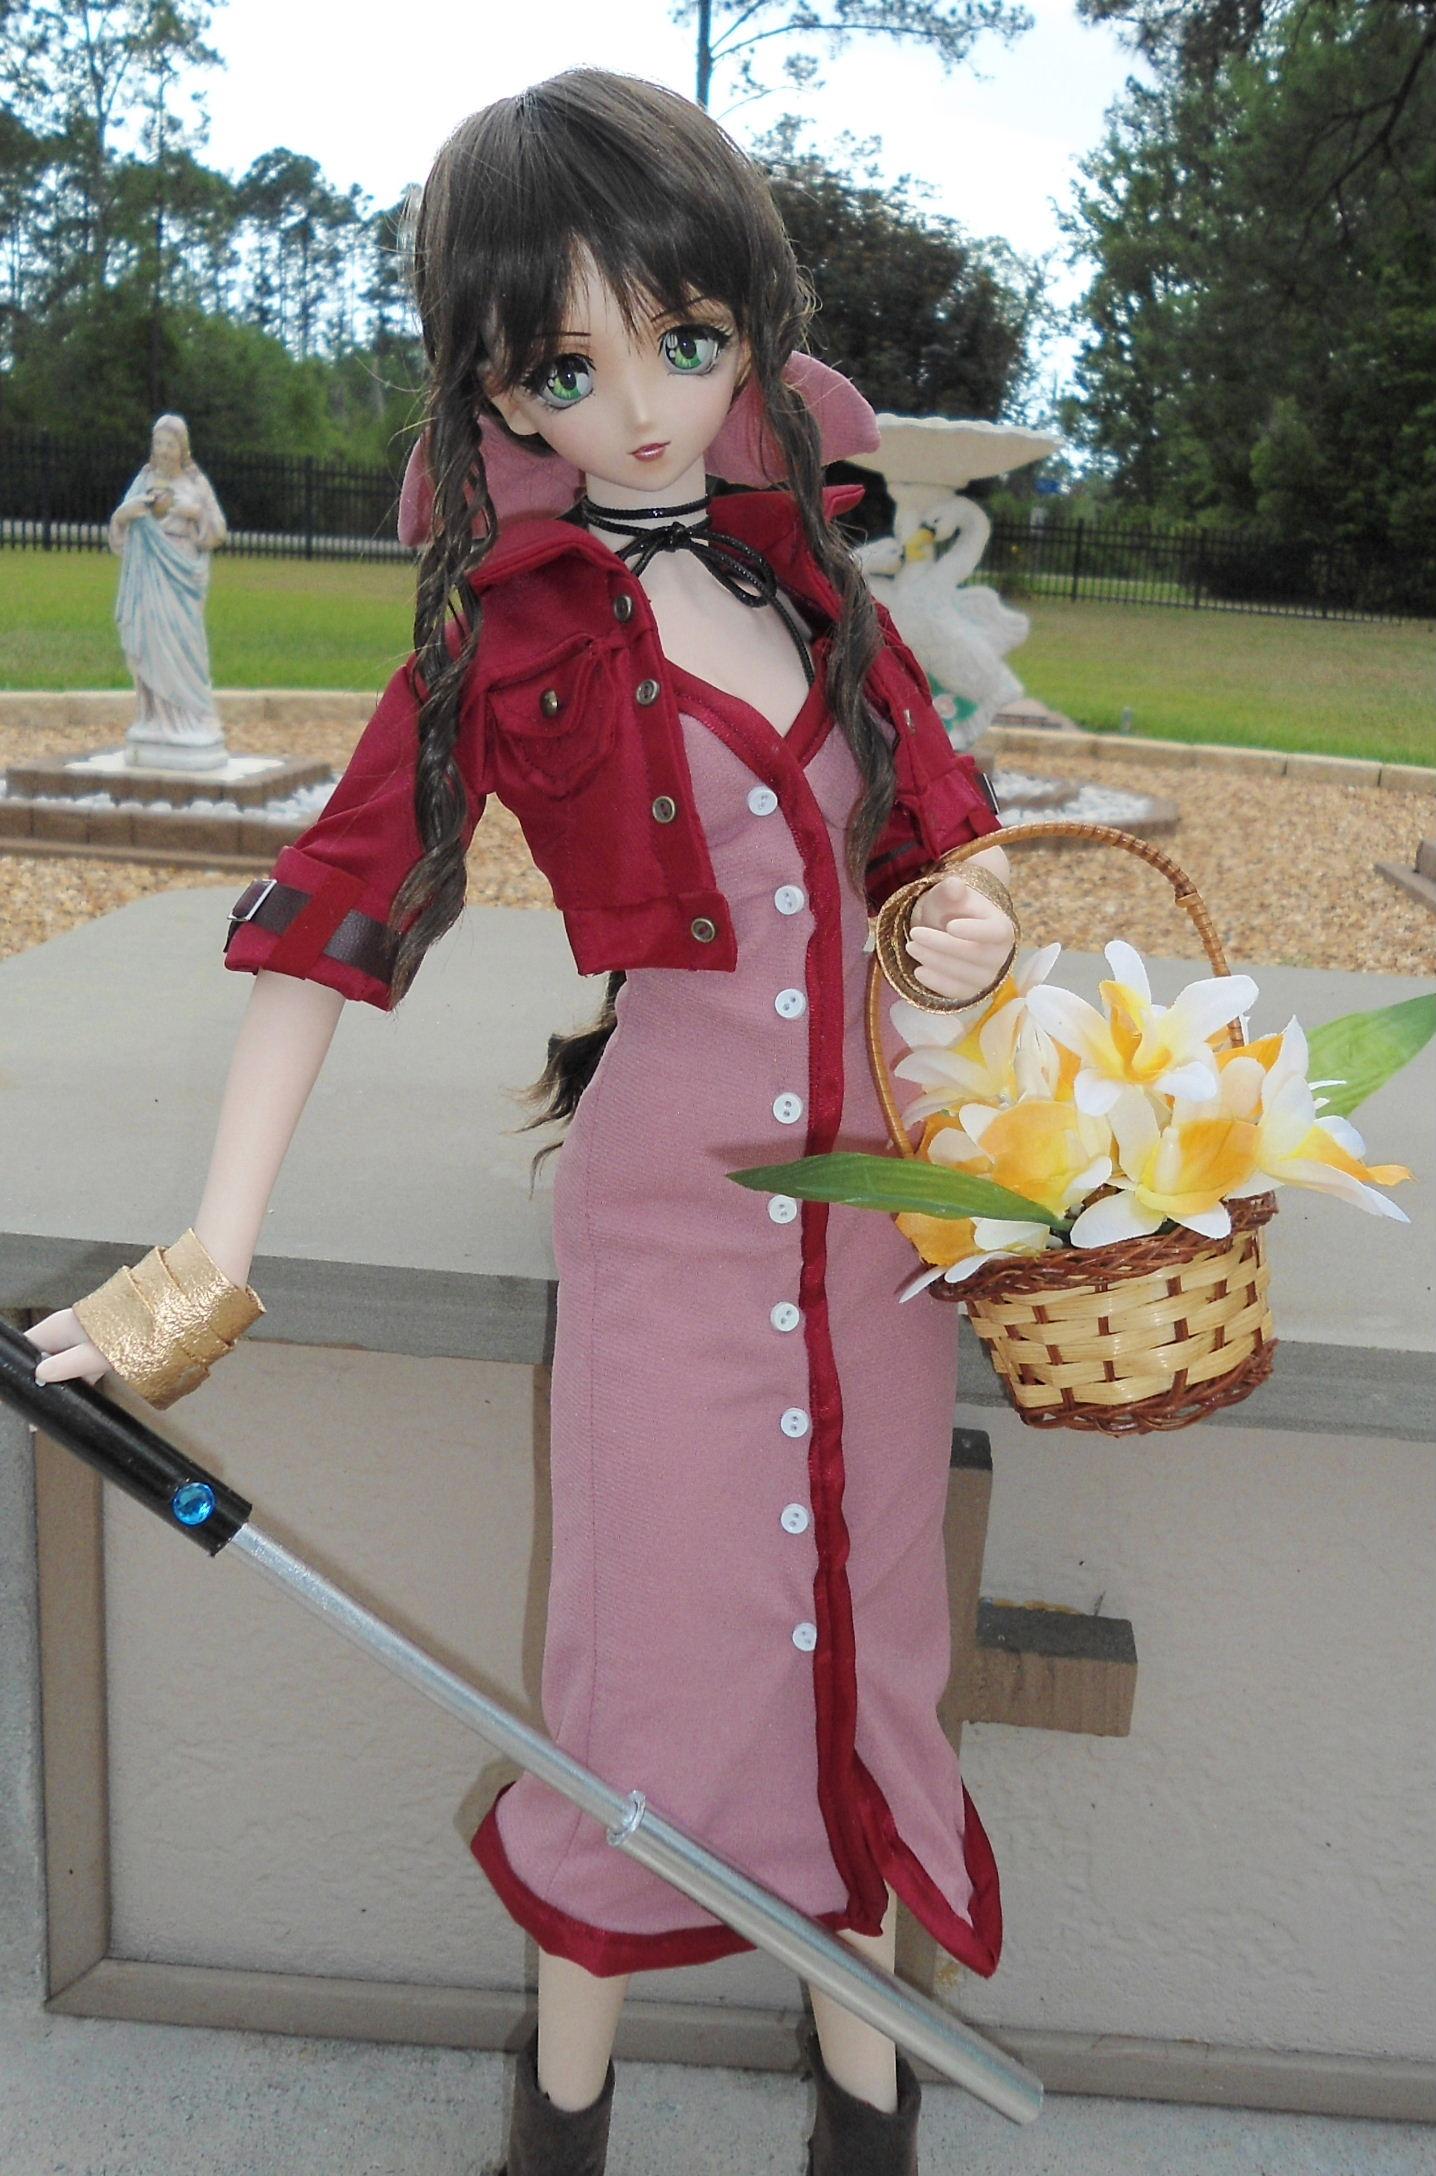 Aerith Gainsborough 24 Volks of Japan Doll